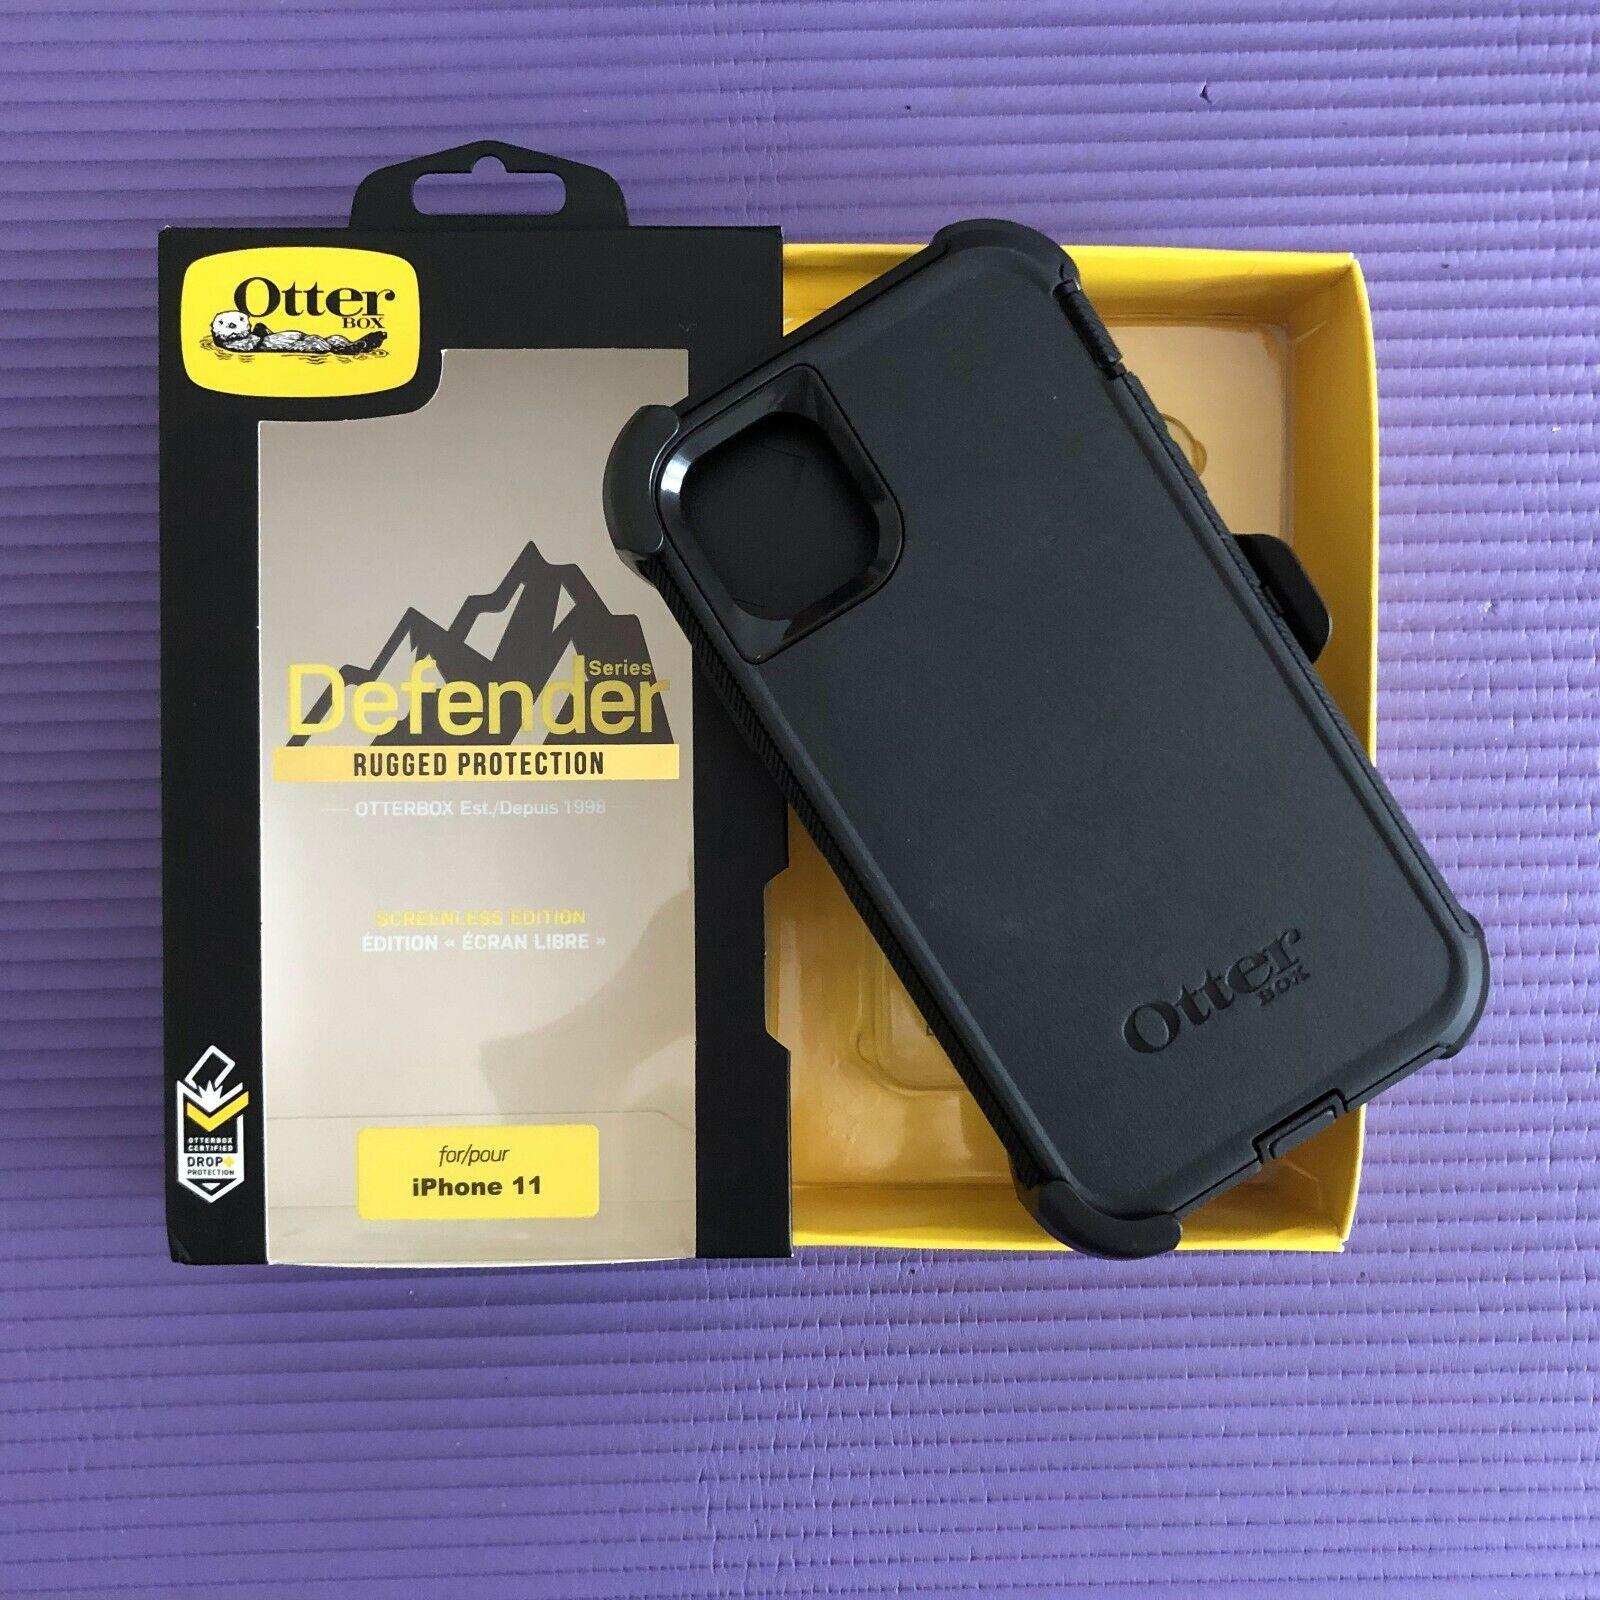 Otterbox Defender & Apple iPhone 11 New